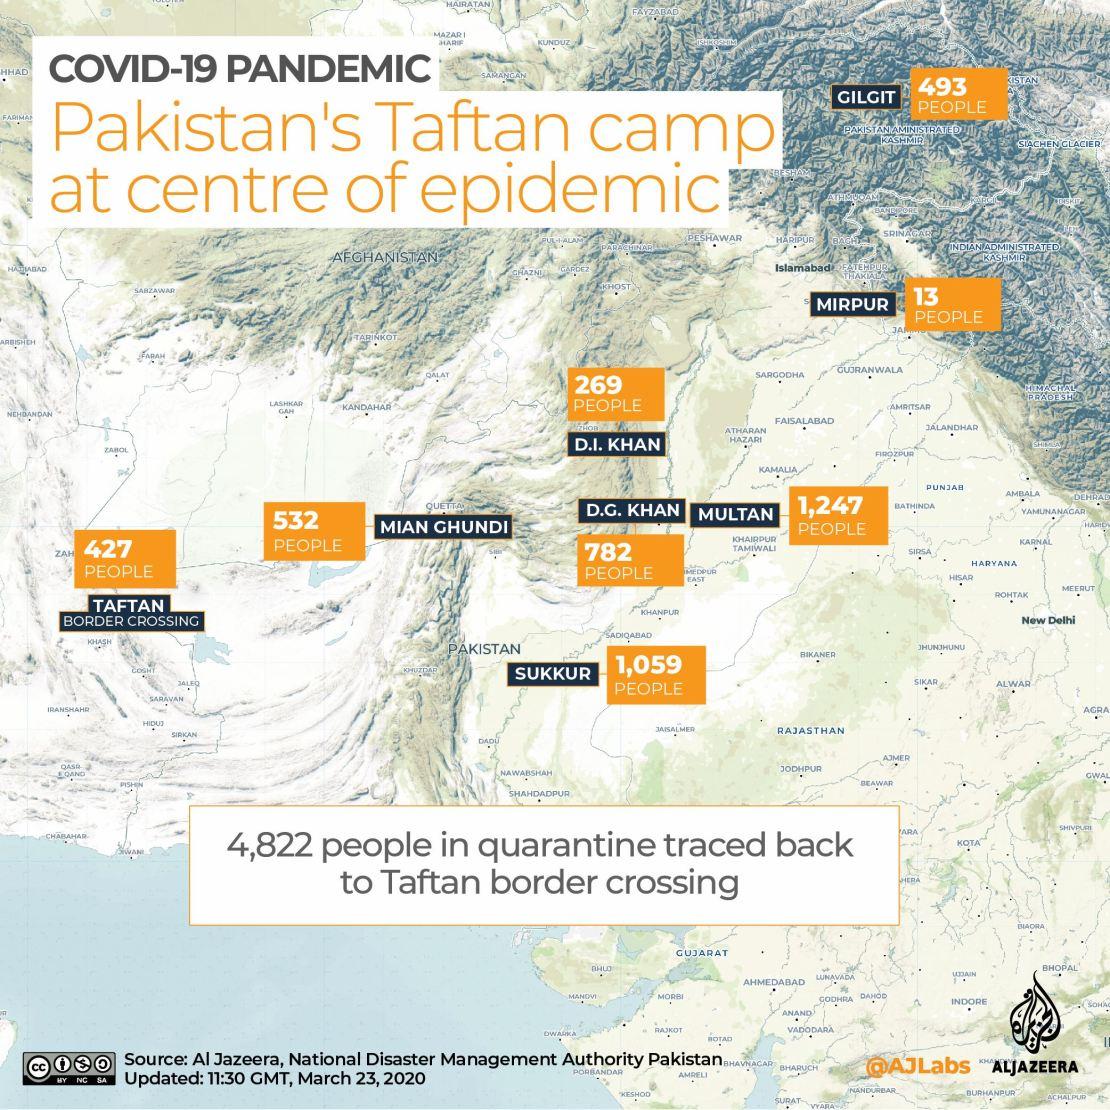 INTERACTIVE: Pakistan COVID-19 map